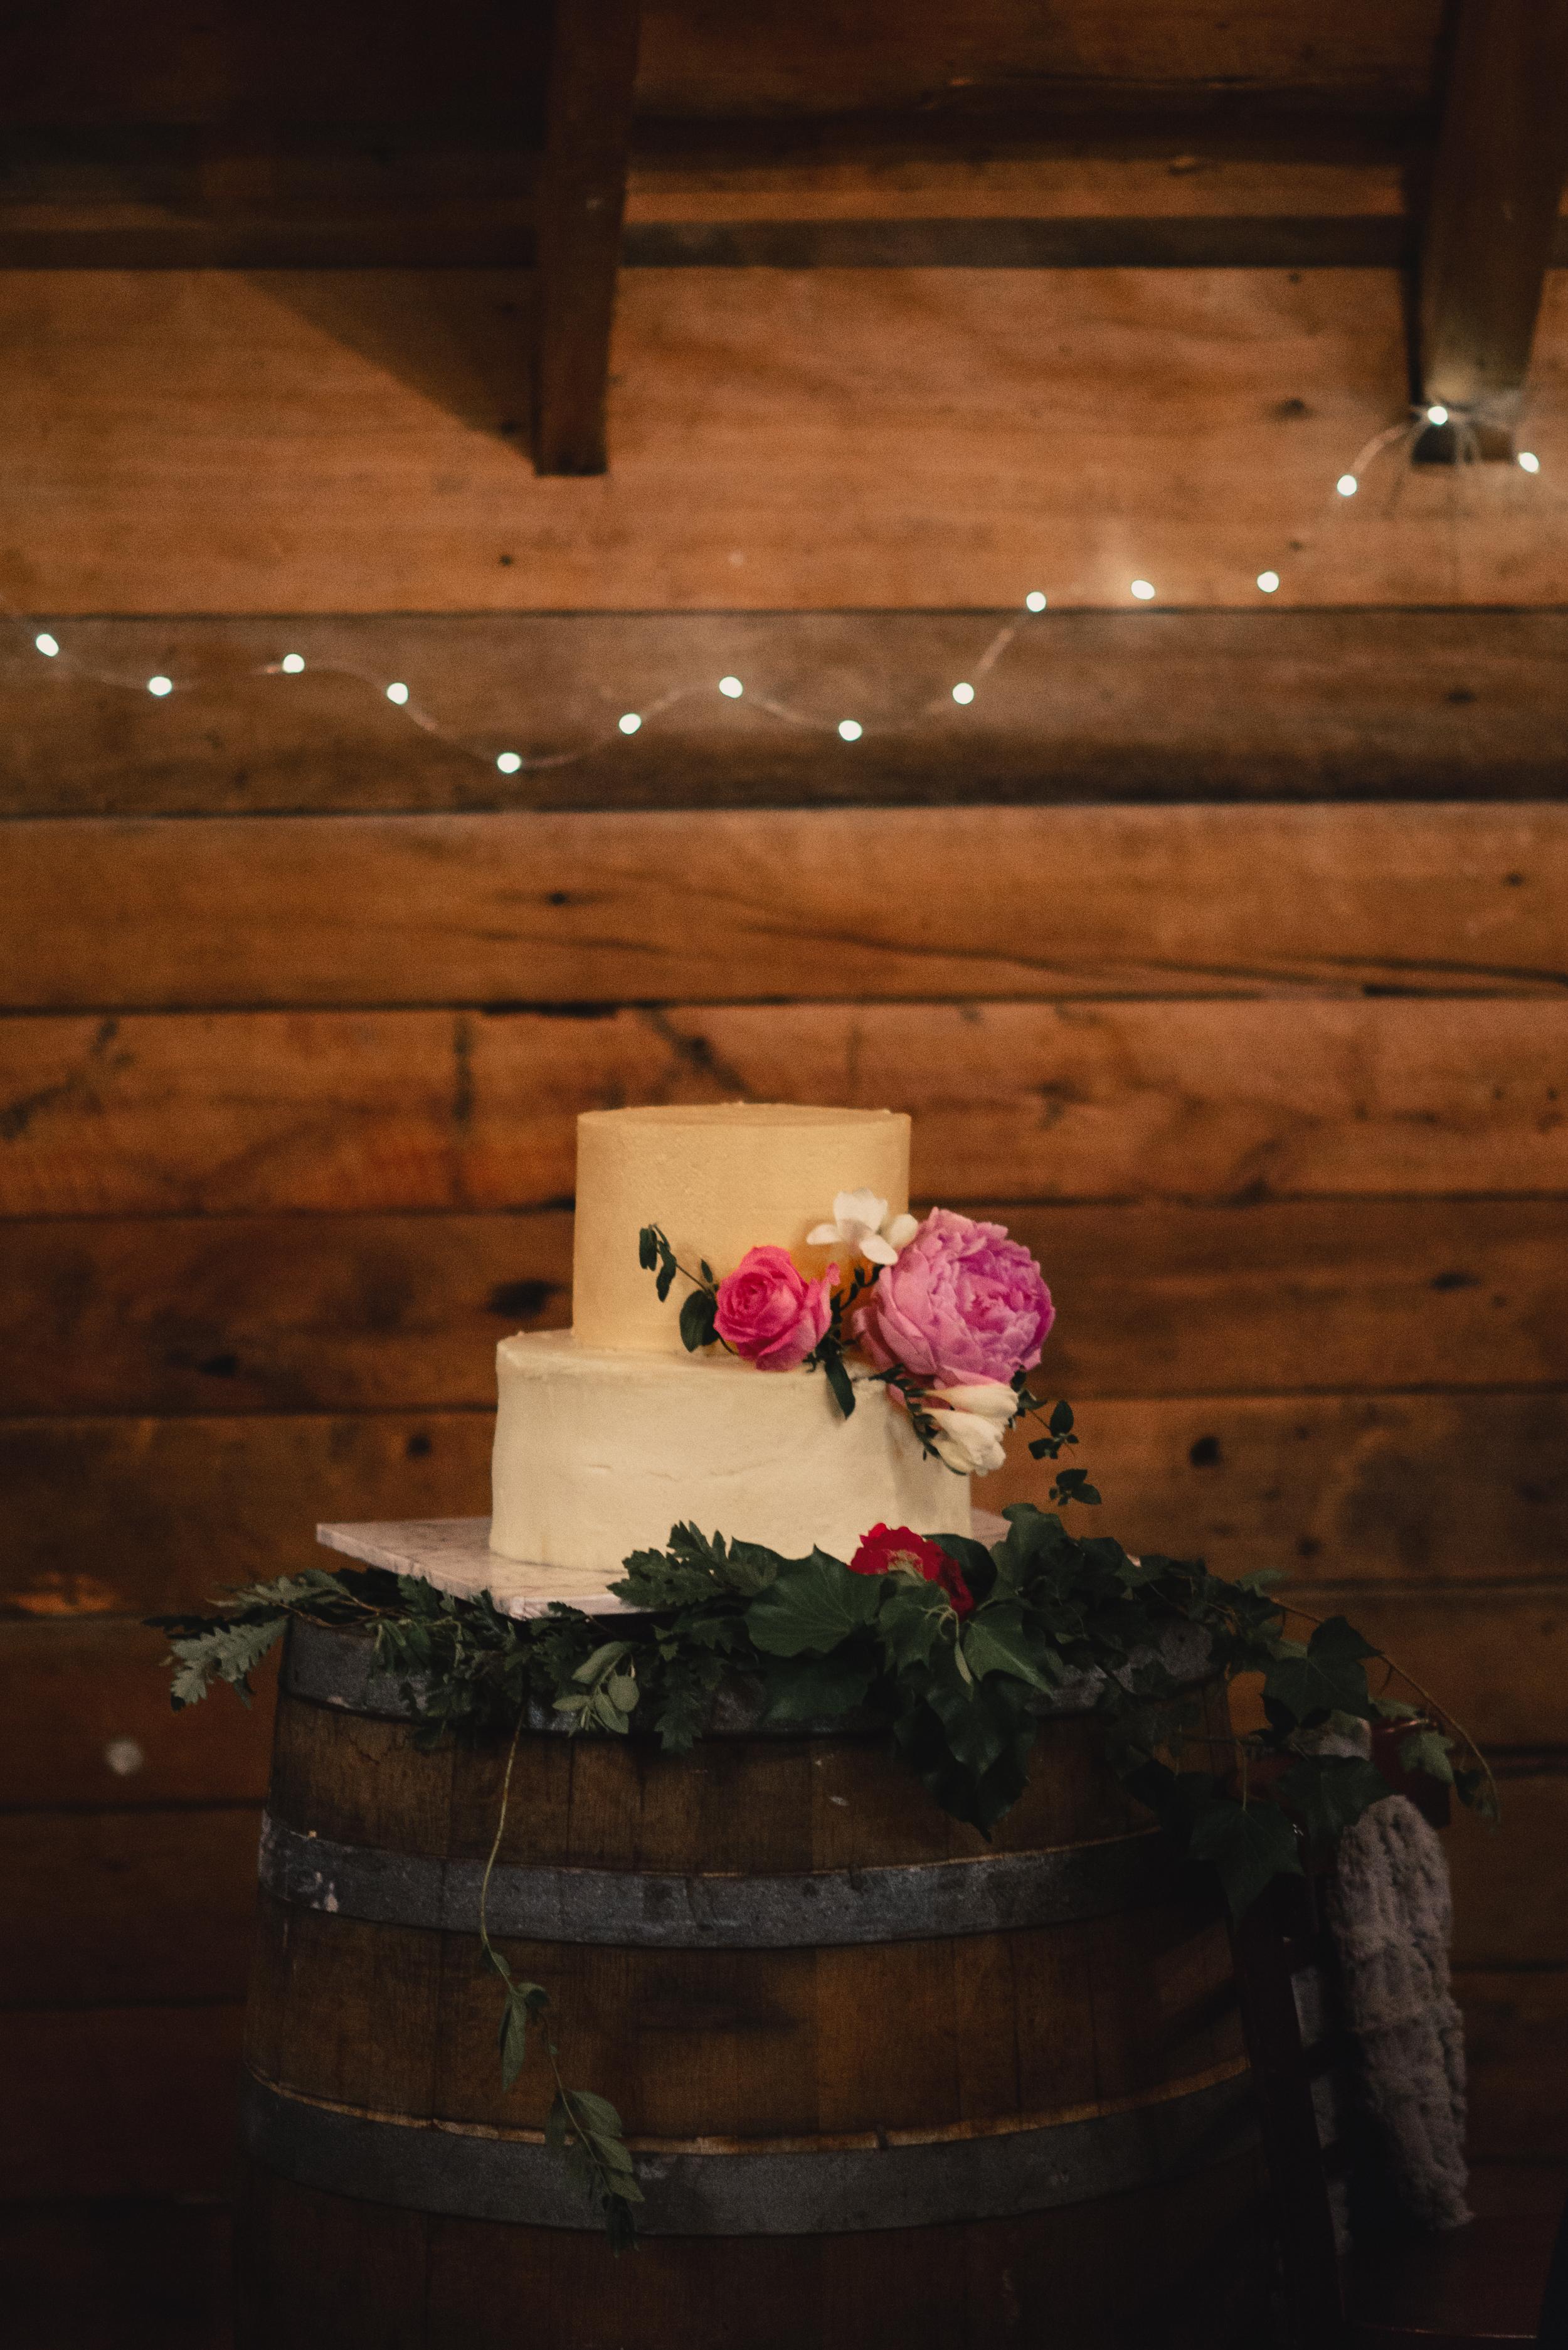 LOVELENSCAPES WEDDING PHOTOGRAPHY • TARUREKA ESTATE WEDDING • ANNA CAMPBELL WINDSOR WEDDING GOWN •FEATHERSTON WEDDING PHOTOGRAPHER • NEW ZEALAND WEDDING PHOTOGRAPHER • MOBILE SIZE • 245.jpg